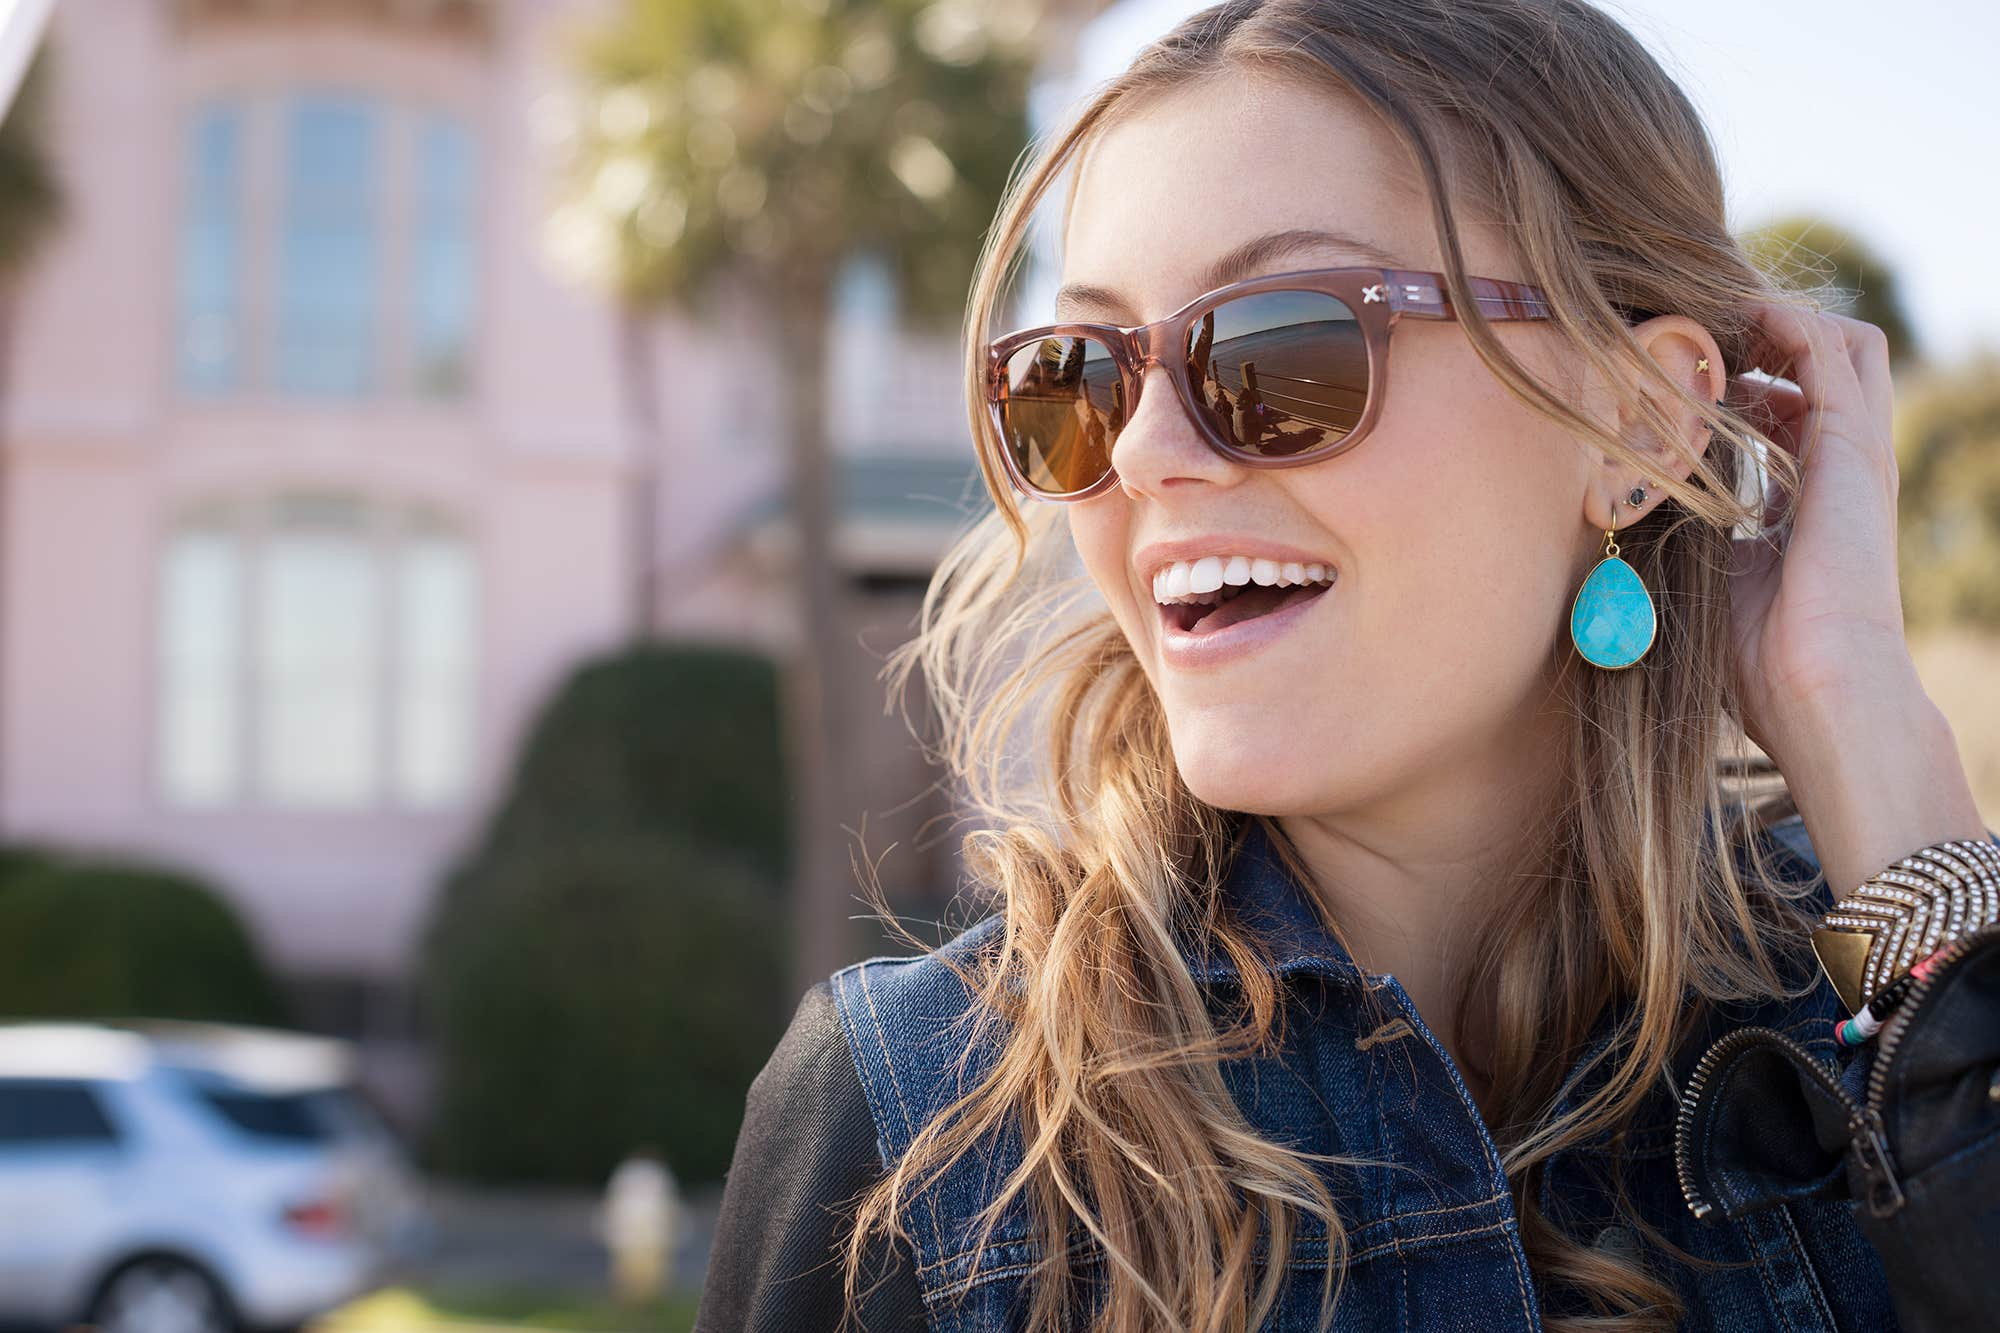 Women RX Sunglasses